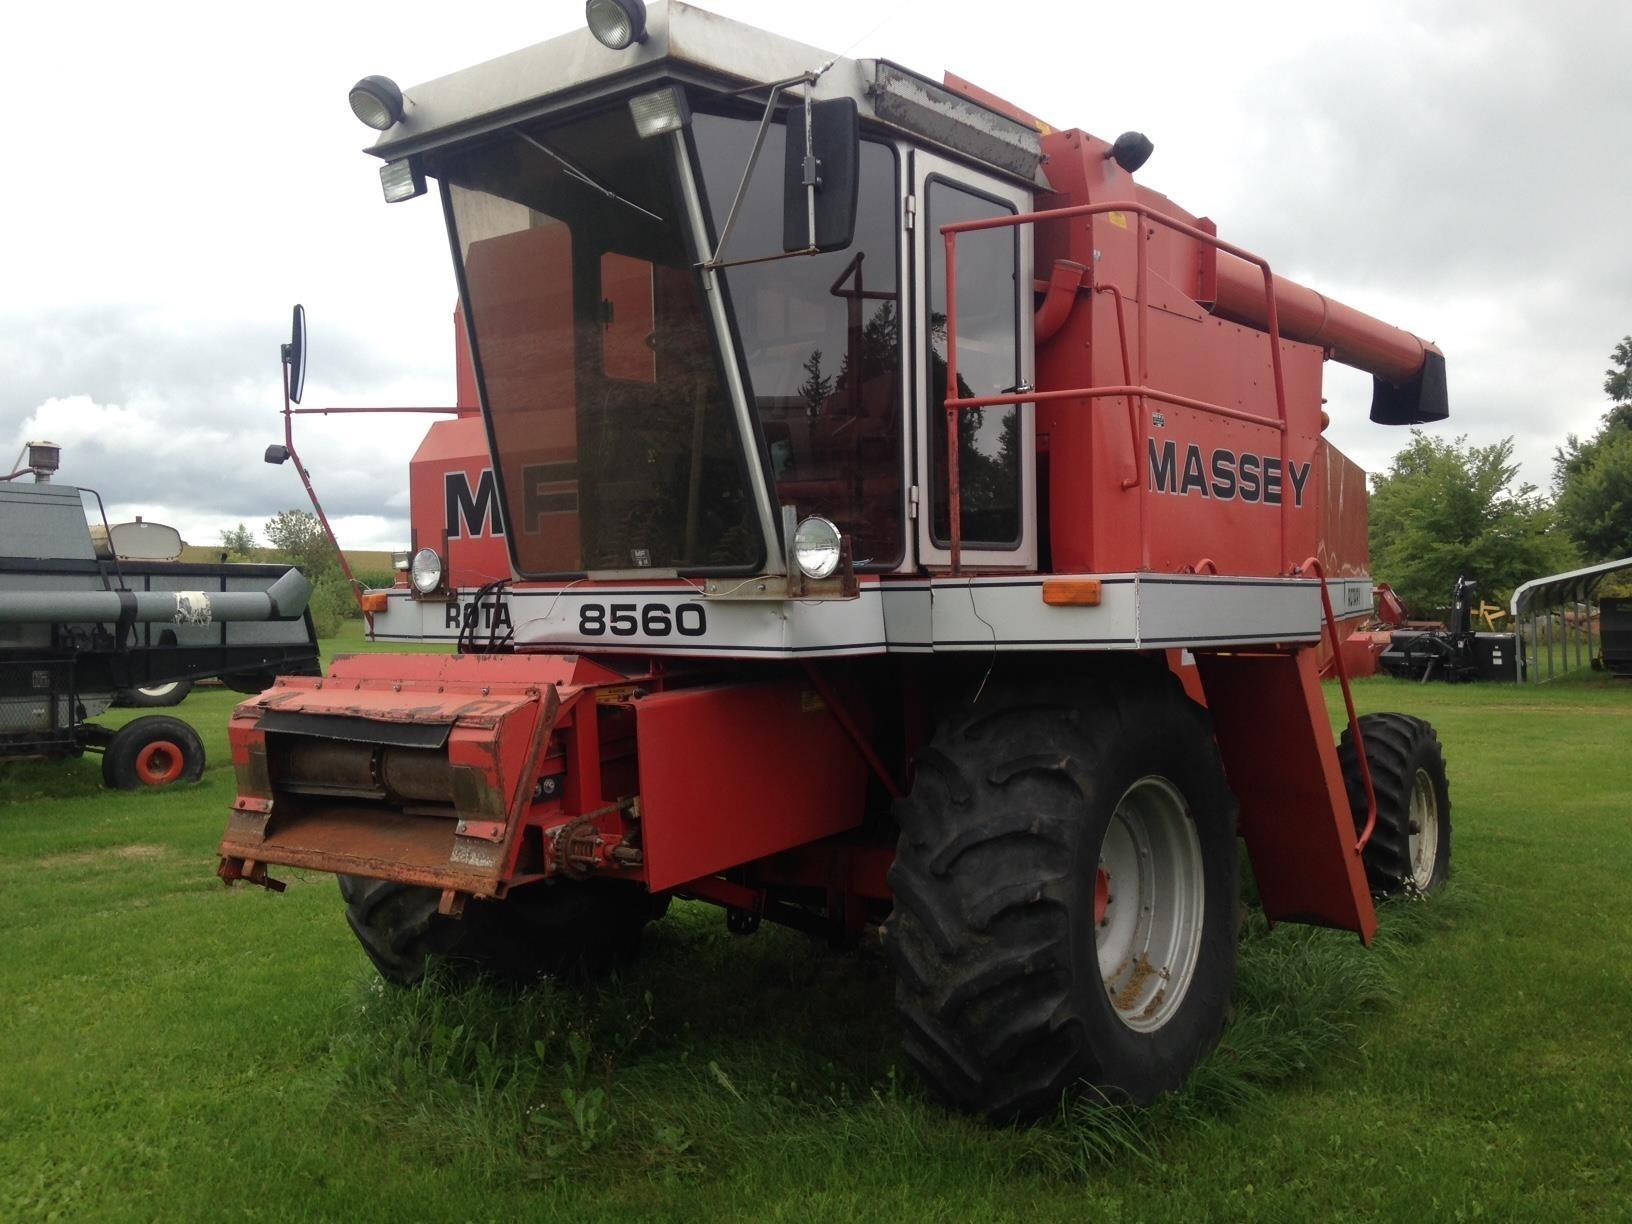 Massey Ferguson 8560 Combine